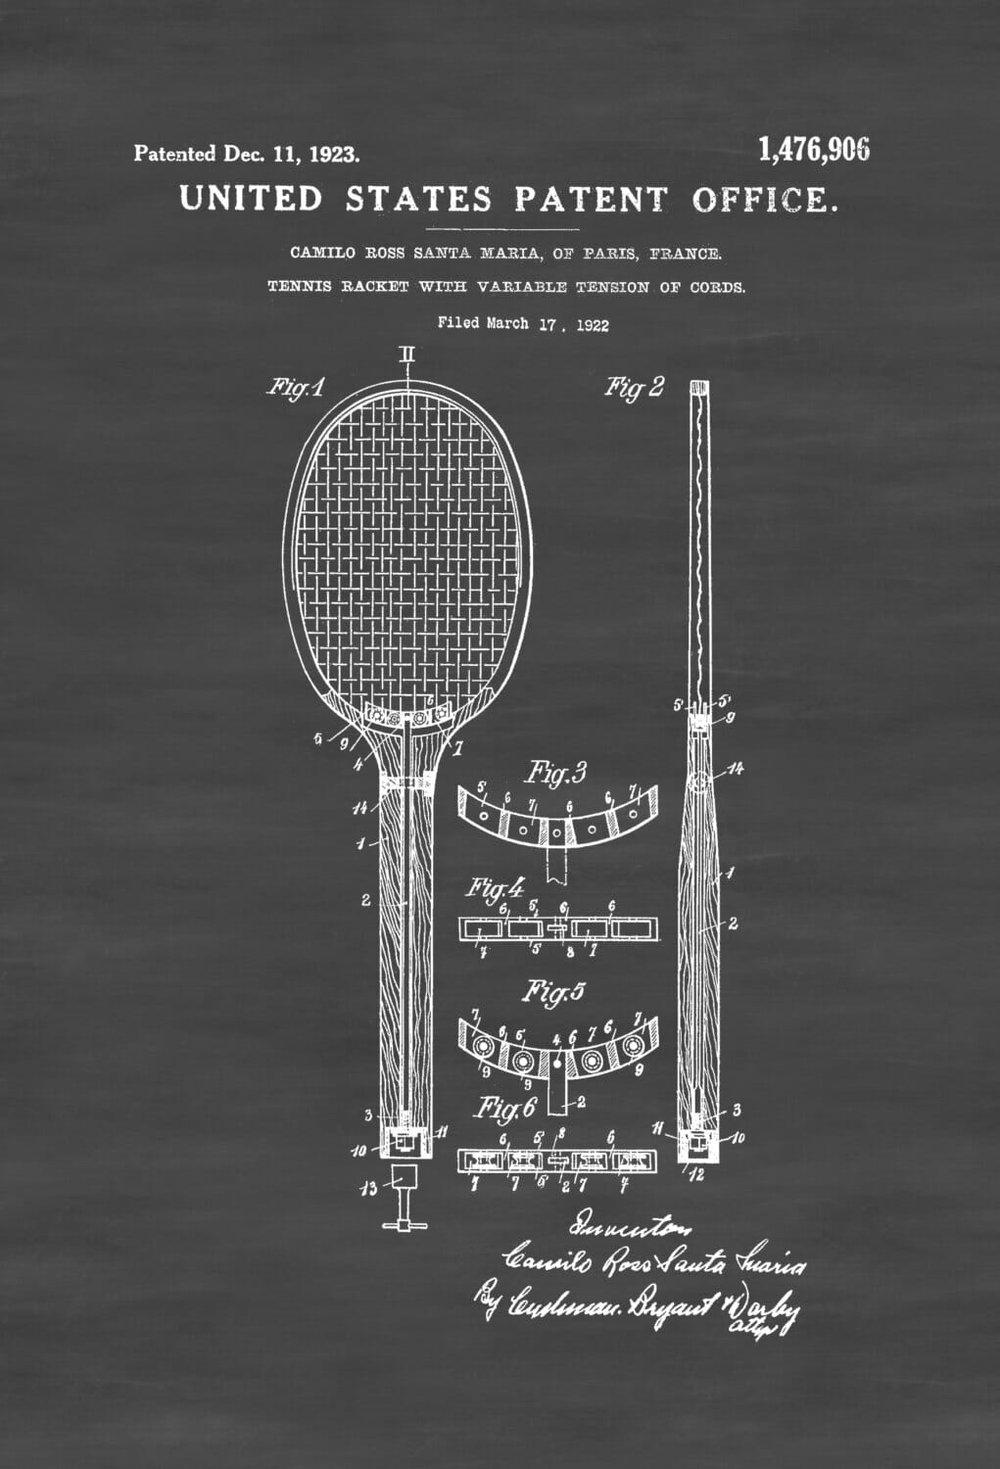 tennis-racket-patent-patent-print-wall-decor-tennis-art-tennis-patent-tennis-gift-tennis-racket-blueprint-tennis-player-gift-5a509b2c.jpg